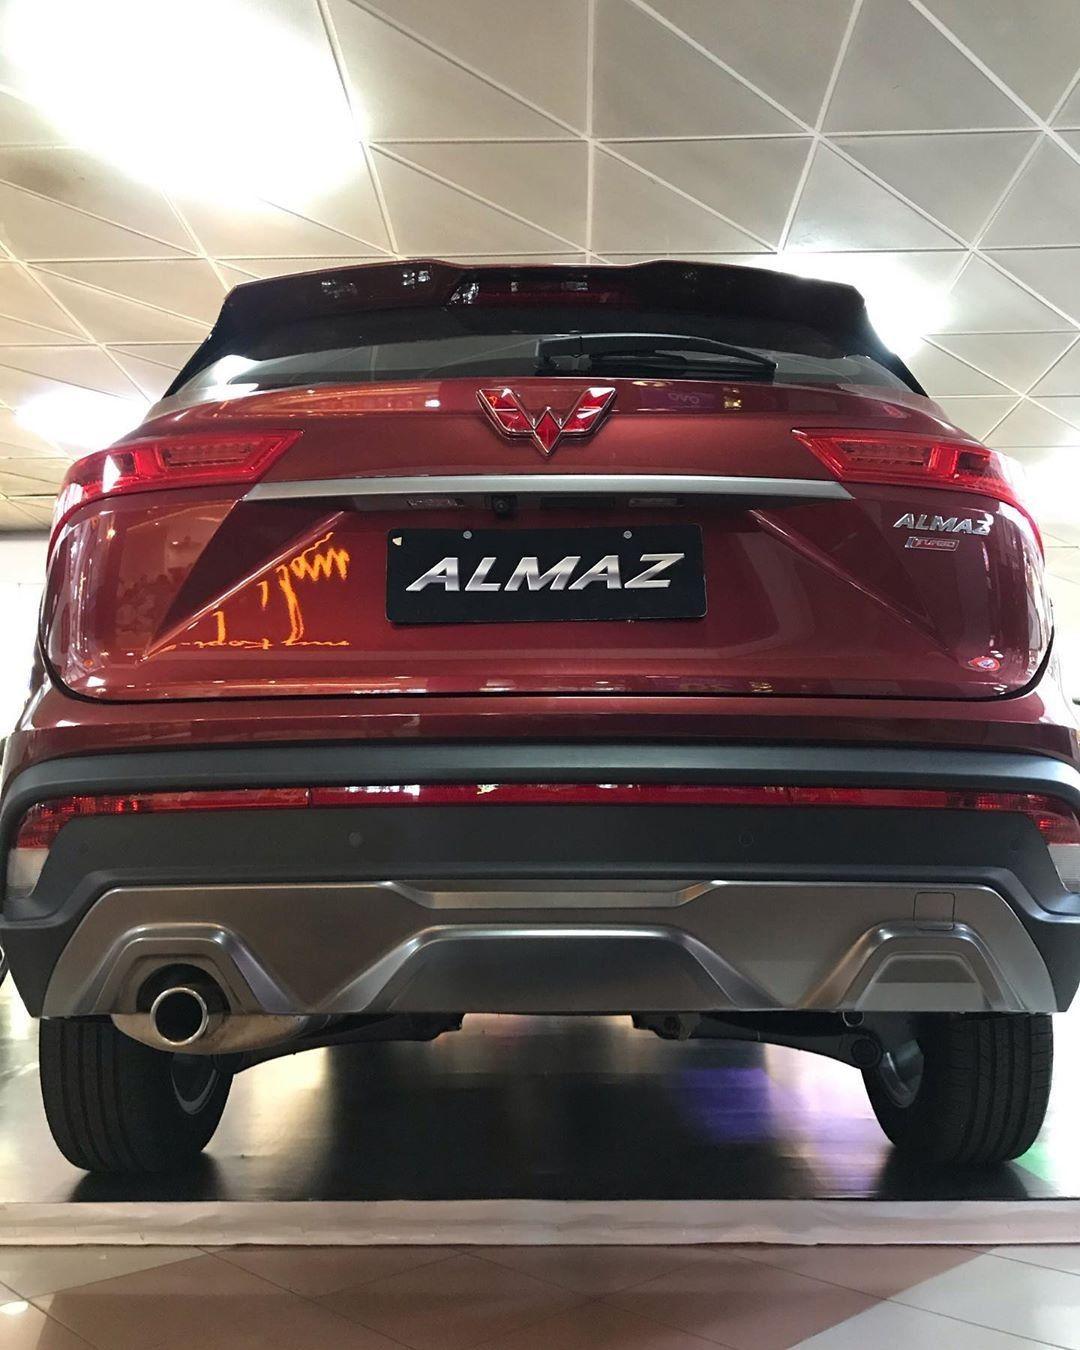 Wuling Almaz Smart Enjoy Mobil Baru